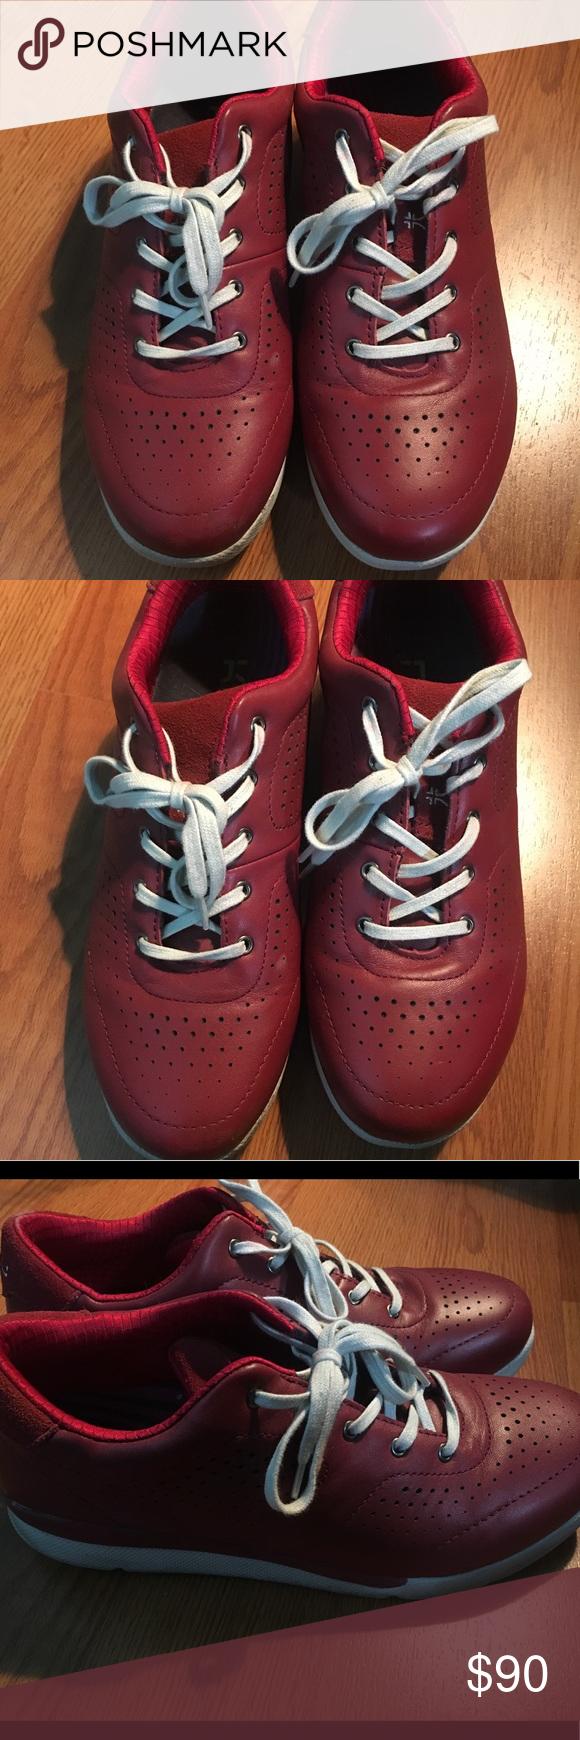 Kuru Lida Maroon Red Sneakers Plantar